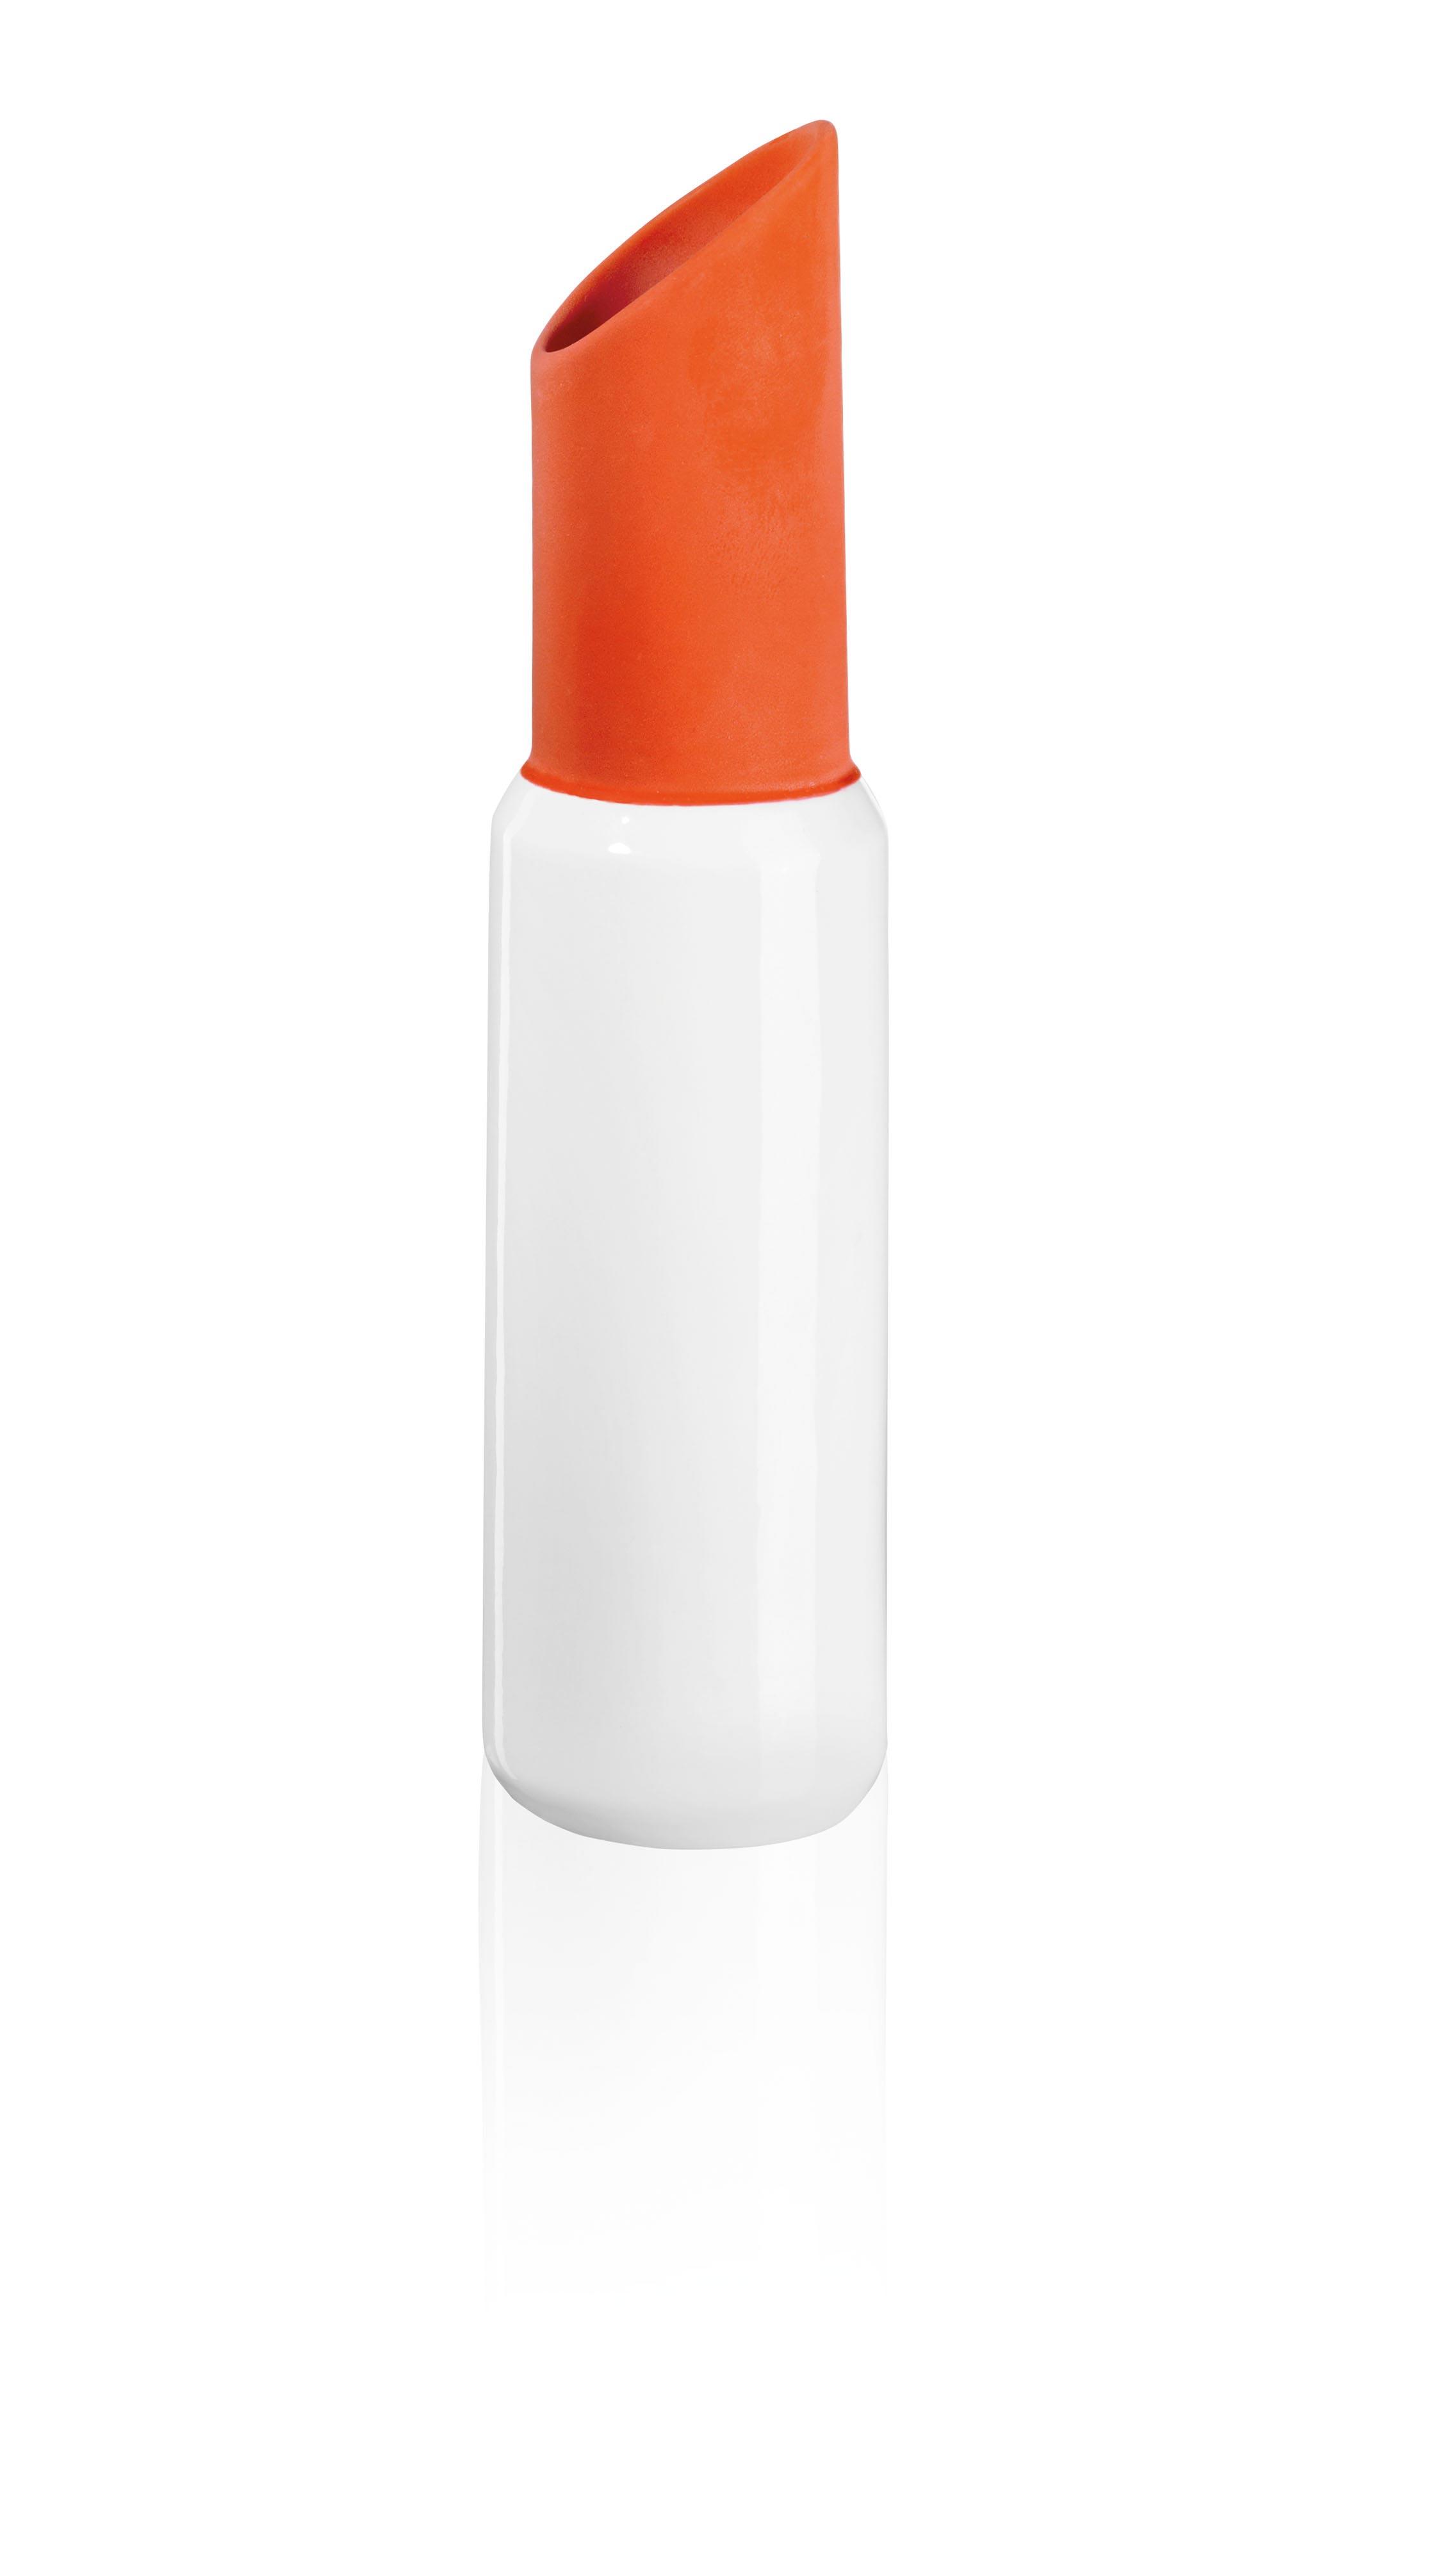 lipstick vase orange vasen wohnaccessoires produkte. Black Bedroom Furniture Sets. Home Design Ideas